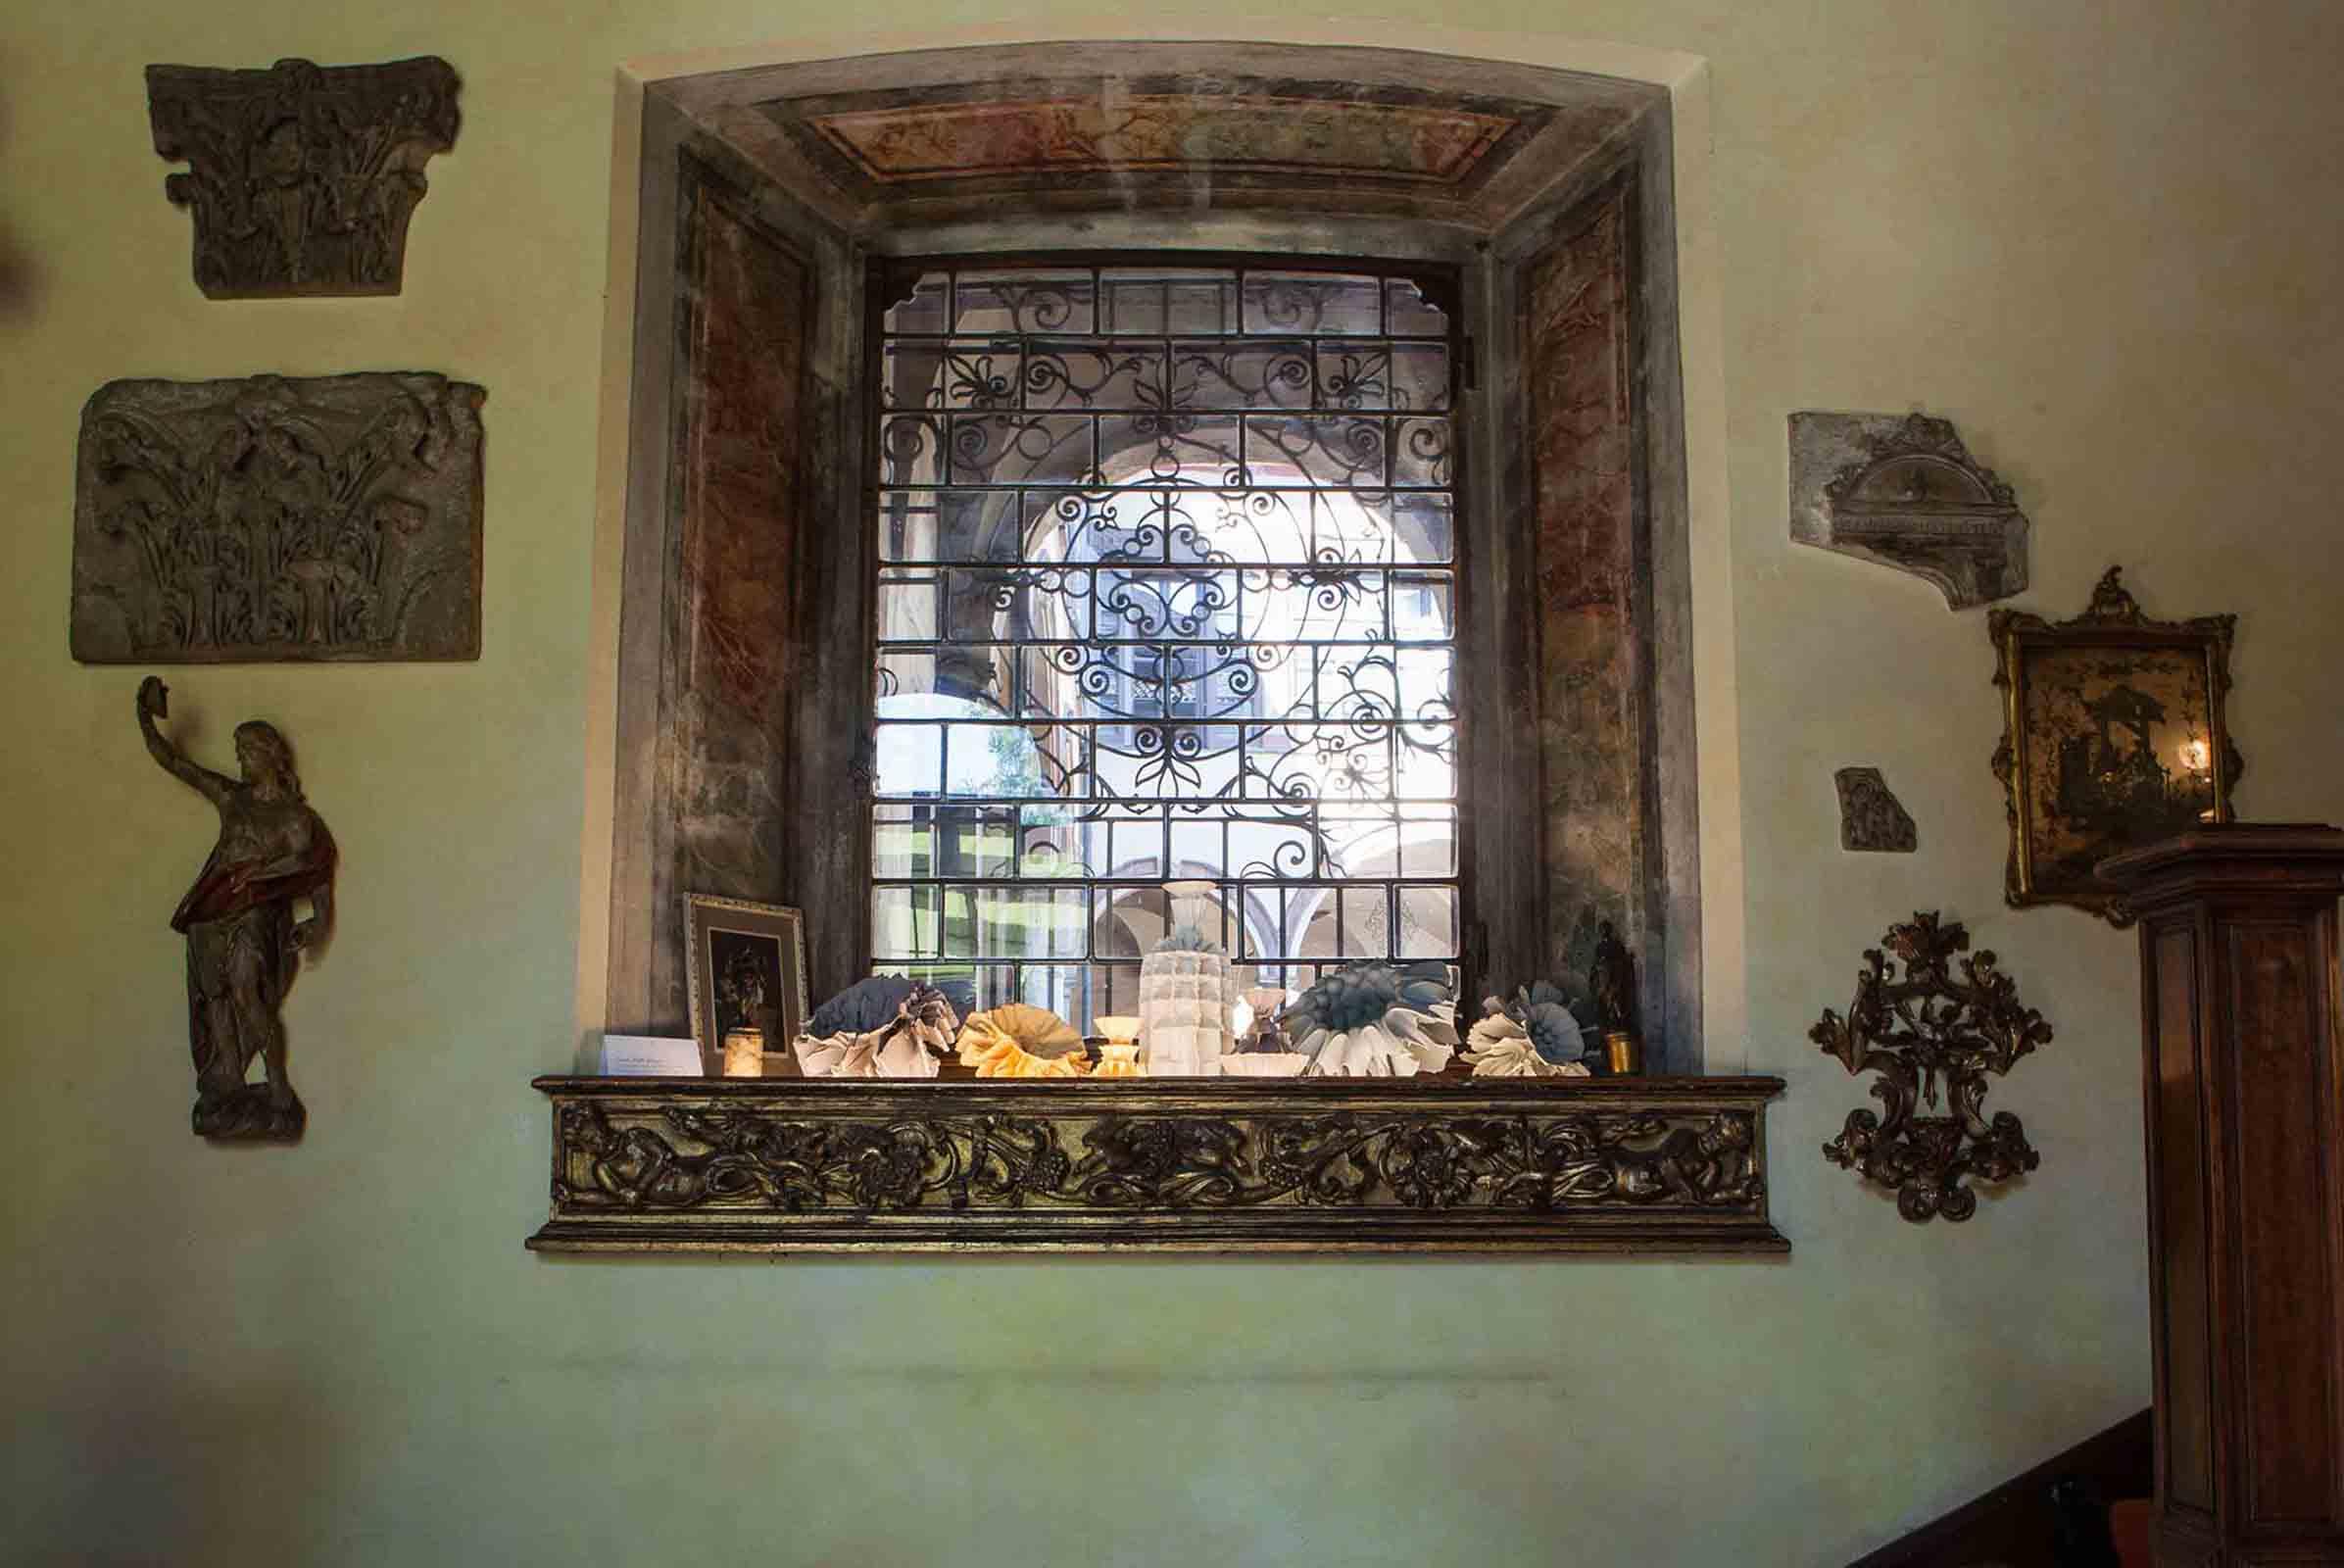 Simon-Zsolt-Josef-at-Passeggiata,-An-Airbnb-Experience-of-Milan-image-2.jpg